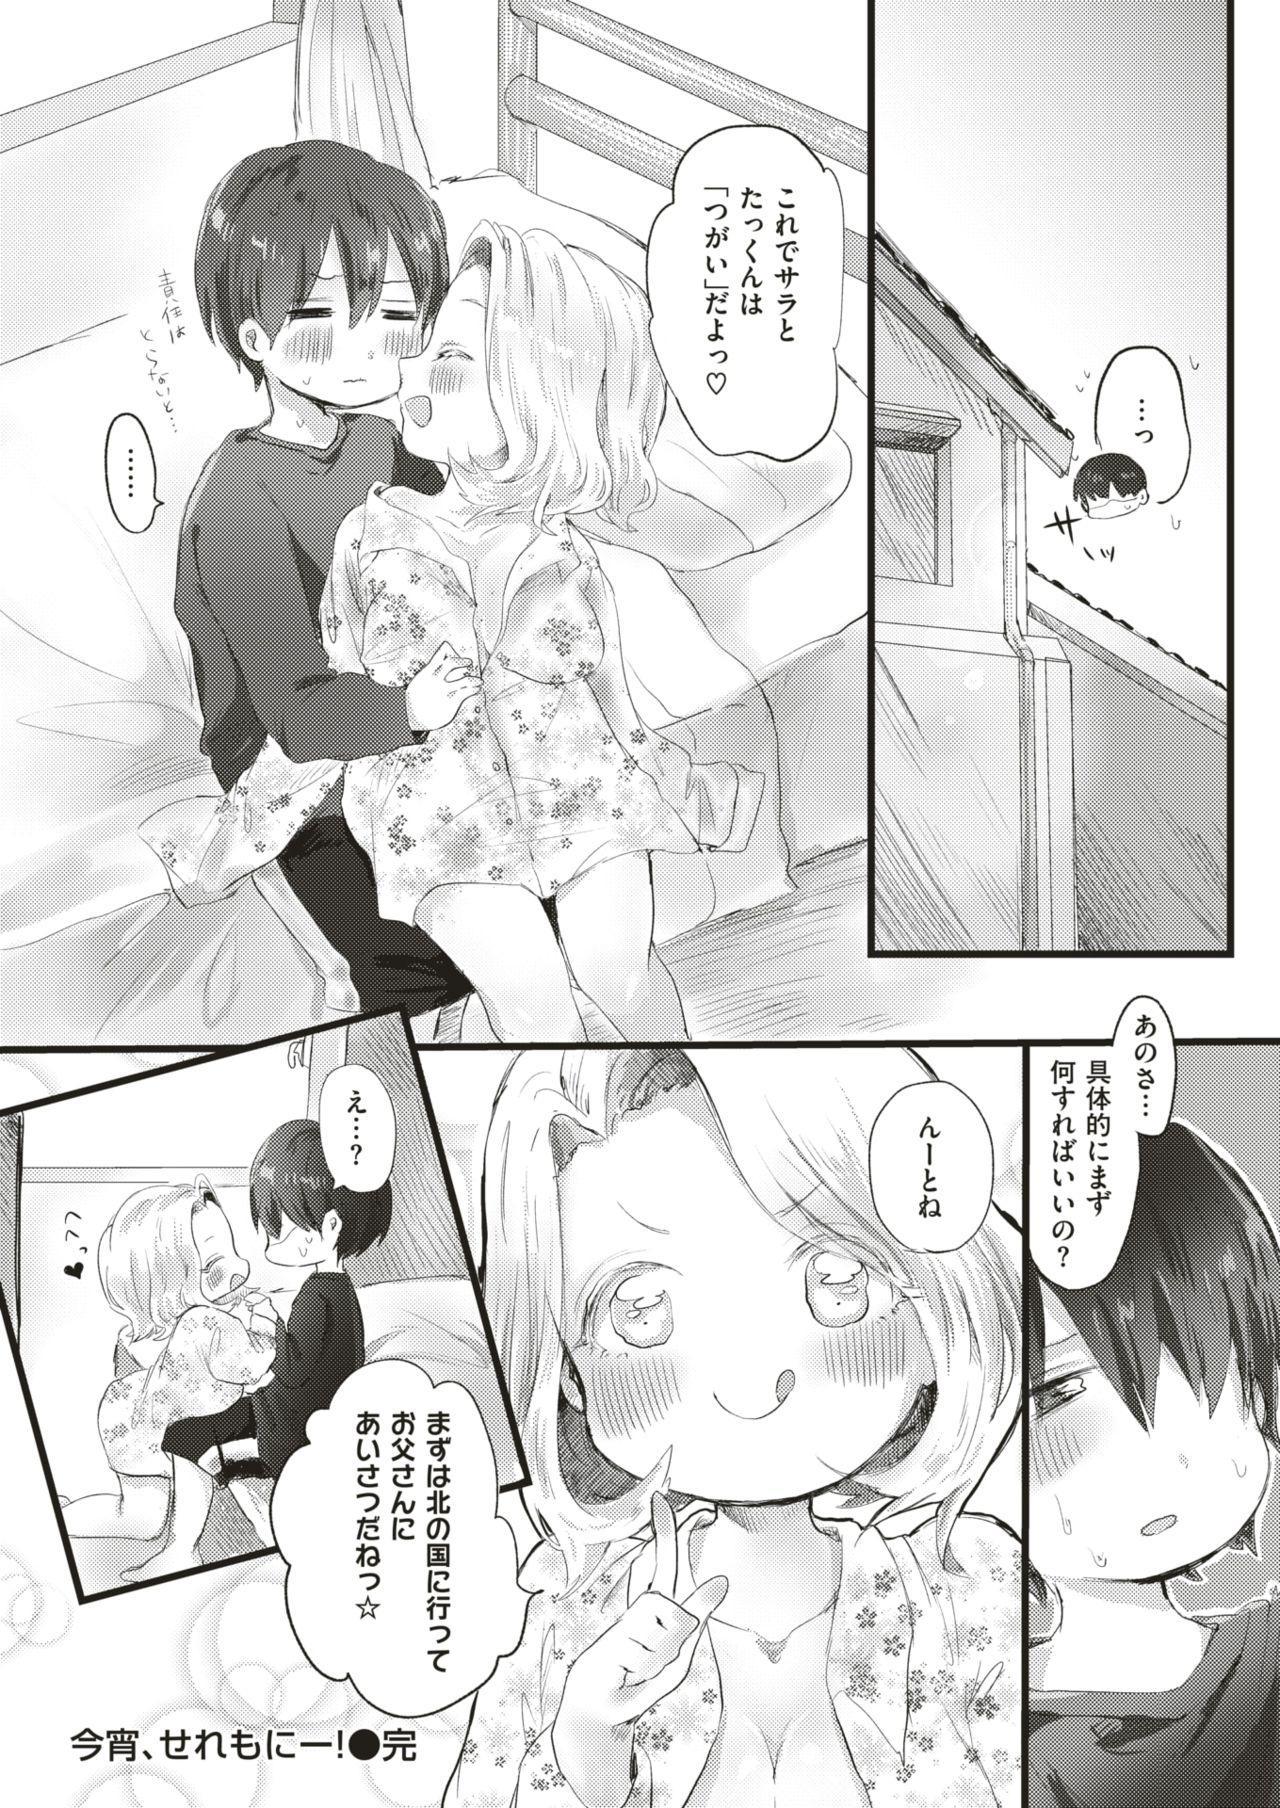 COMIC HAPPINING Vol. 4 102